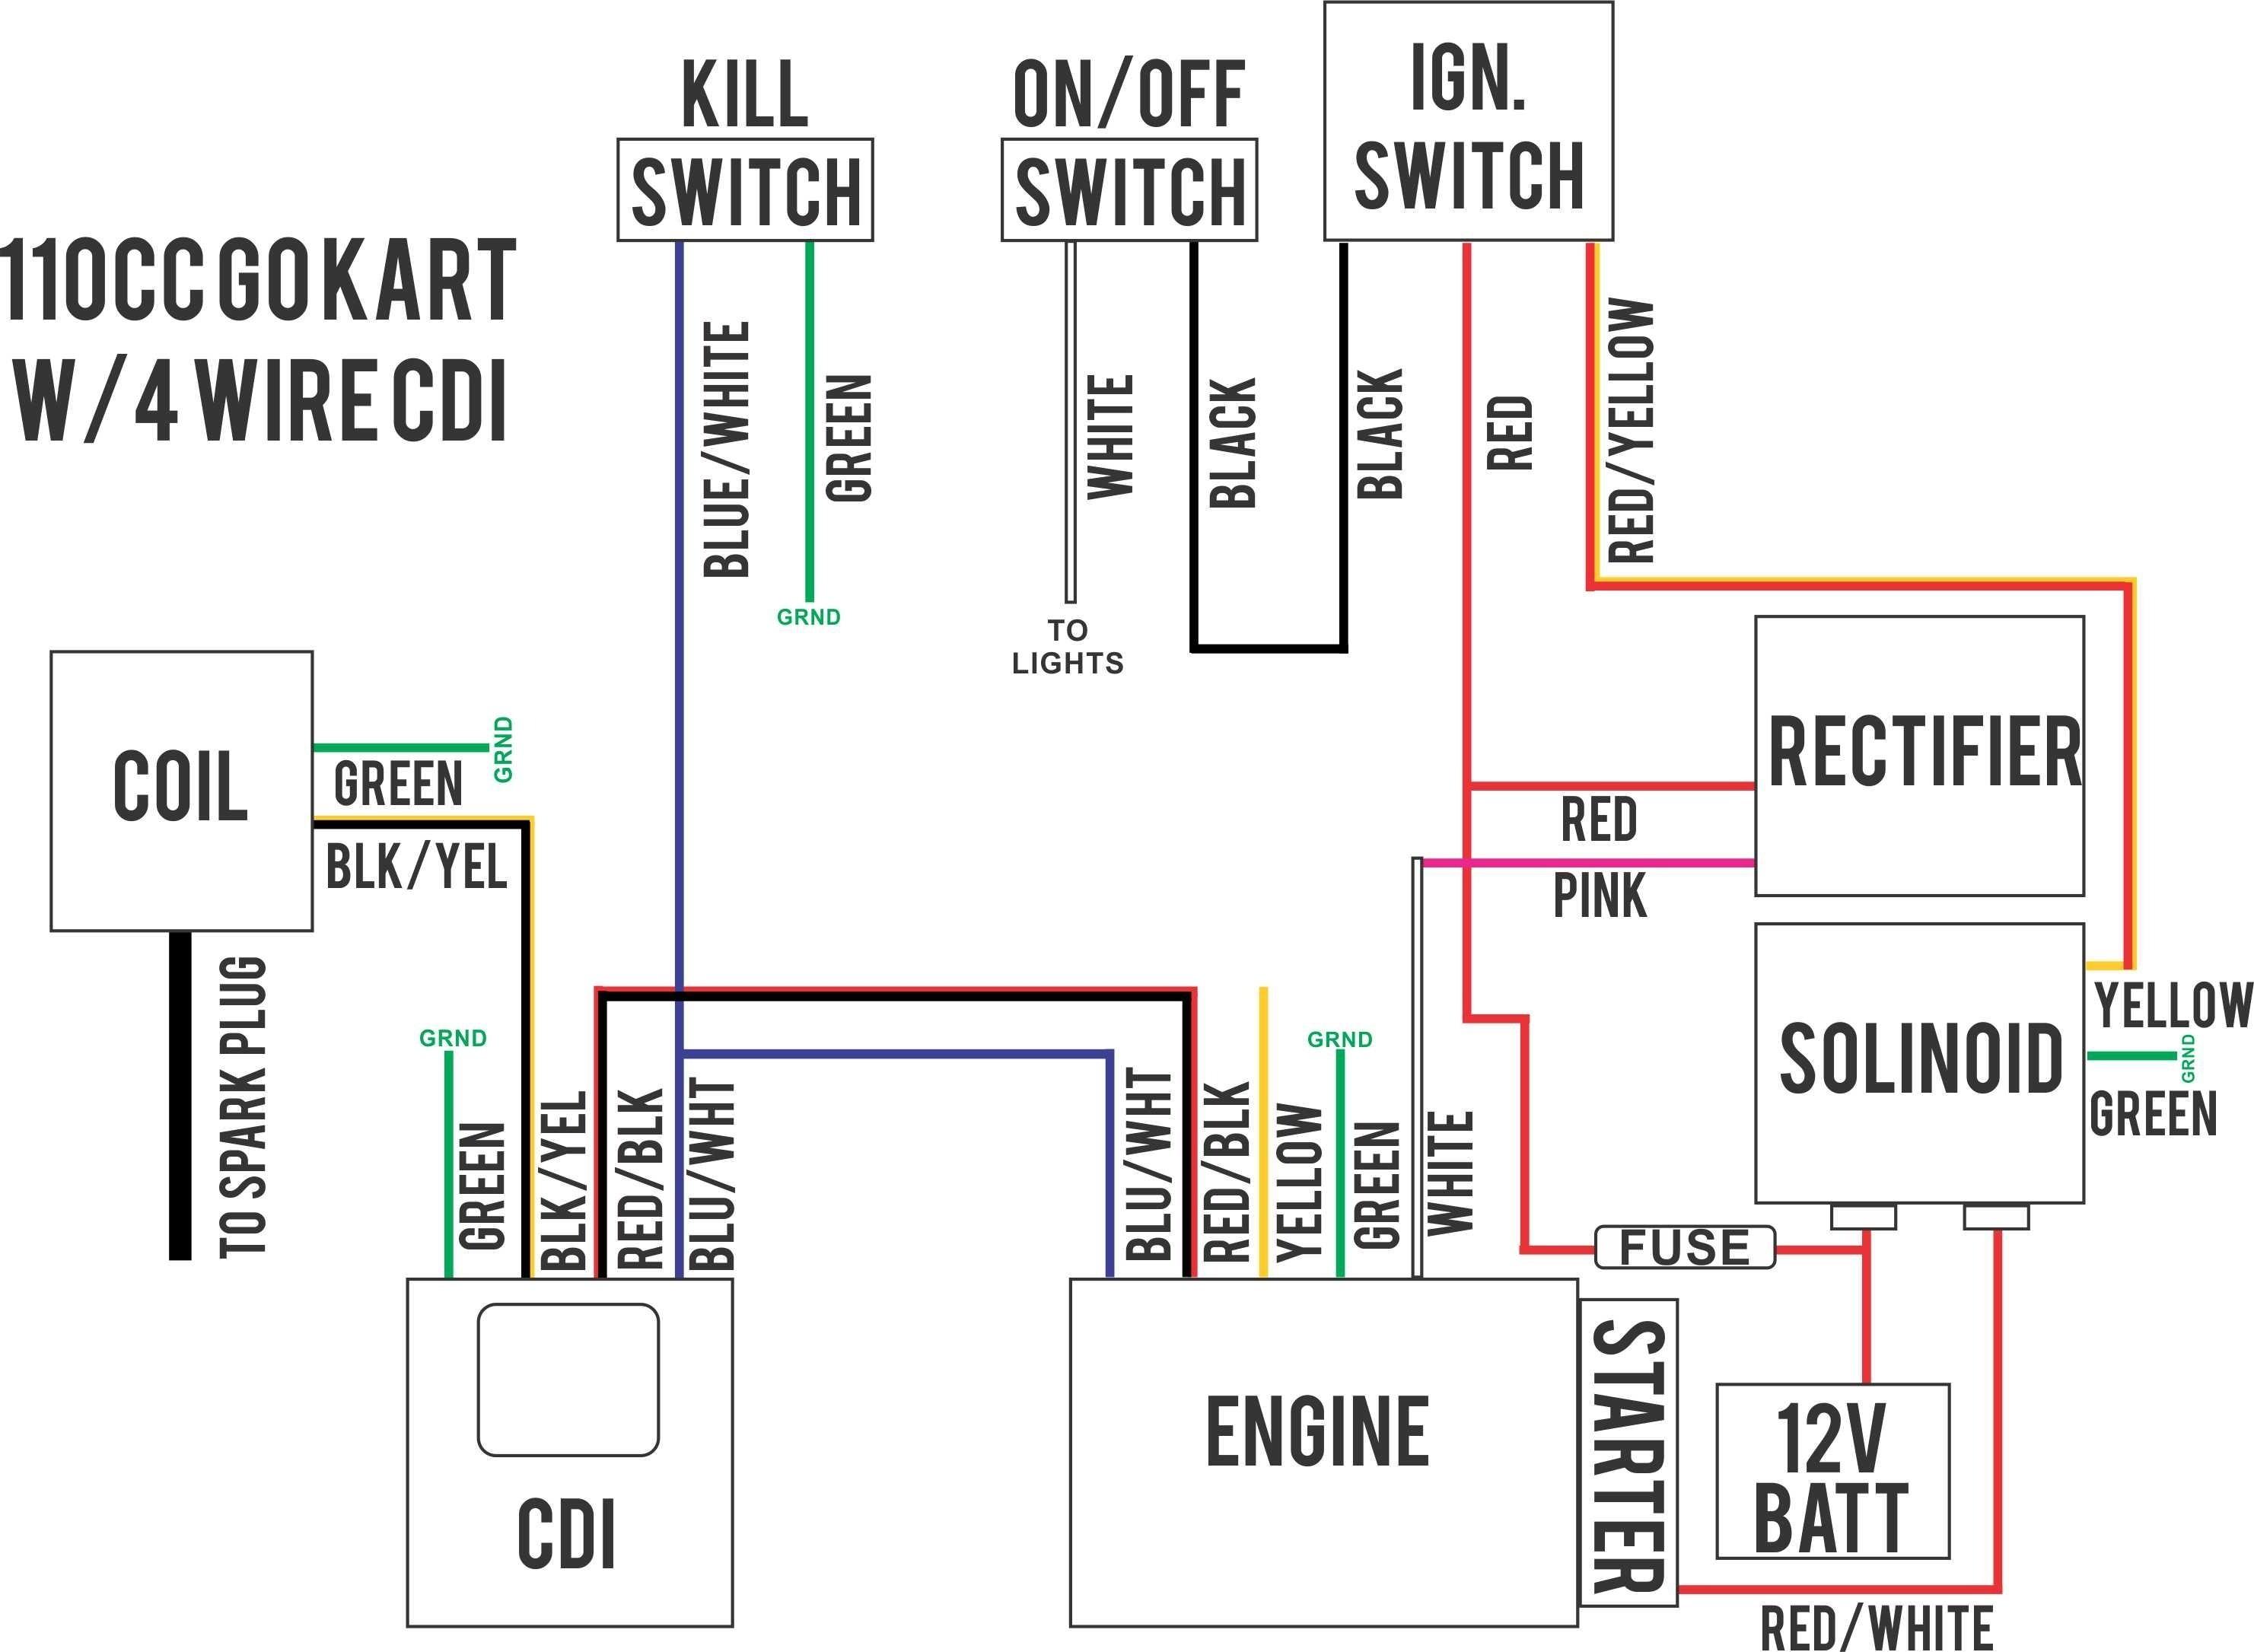 Car Ignition System Diagram Car Ignition Wiring Diagram Wiring Diagram Of Car Ignition System Diagram